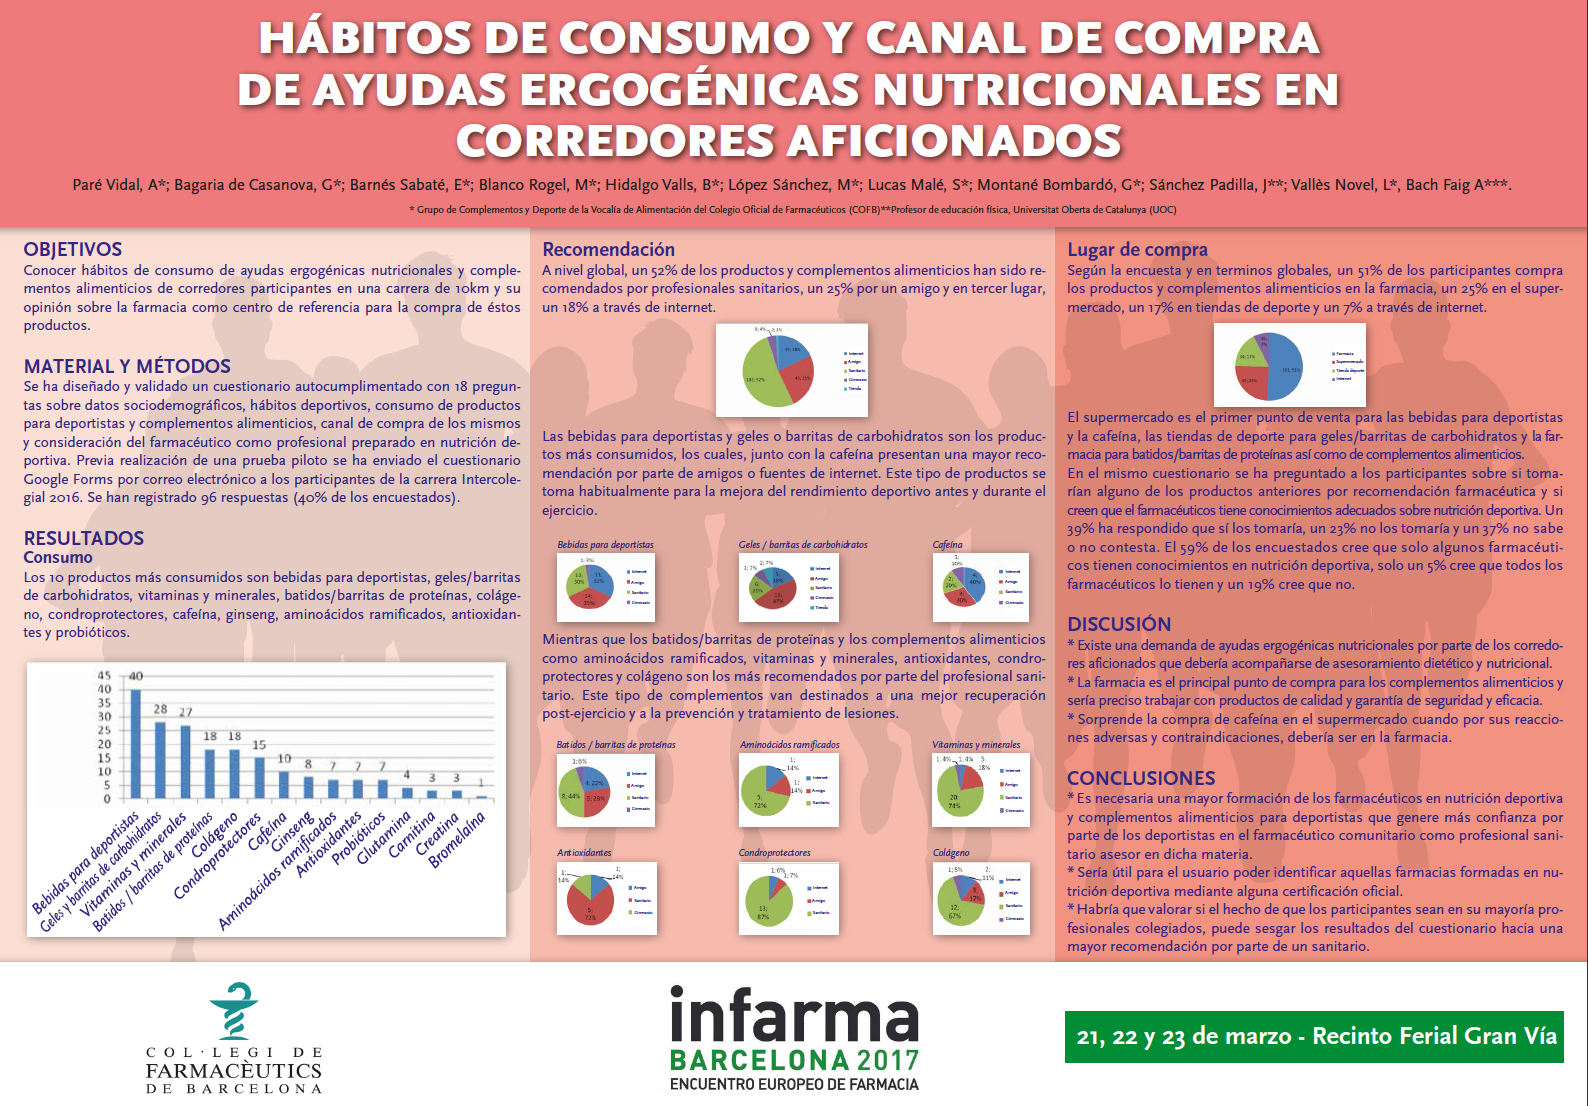 Infarma poster